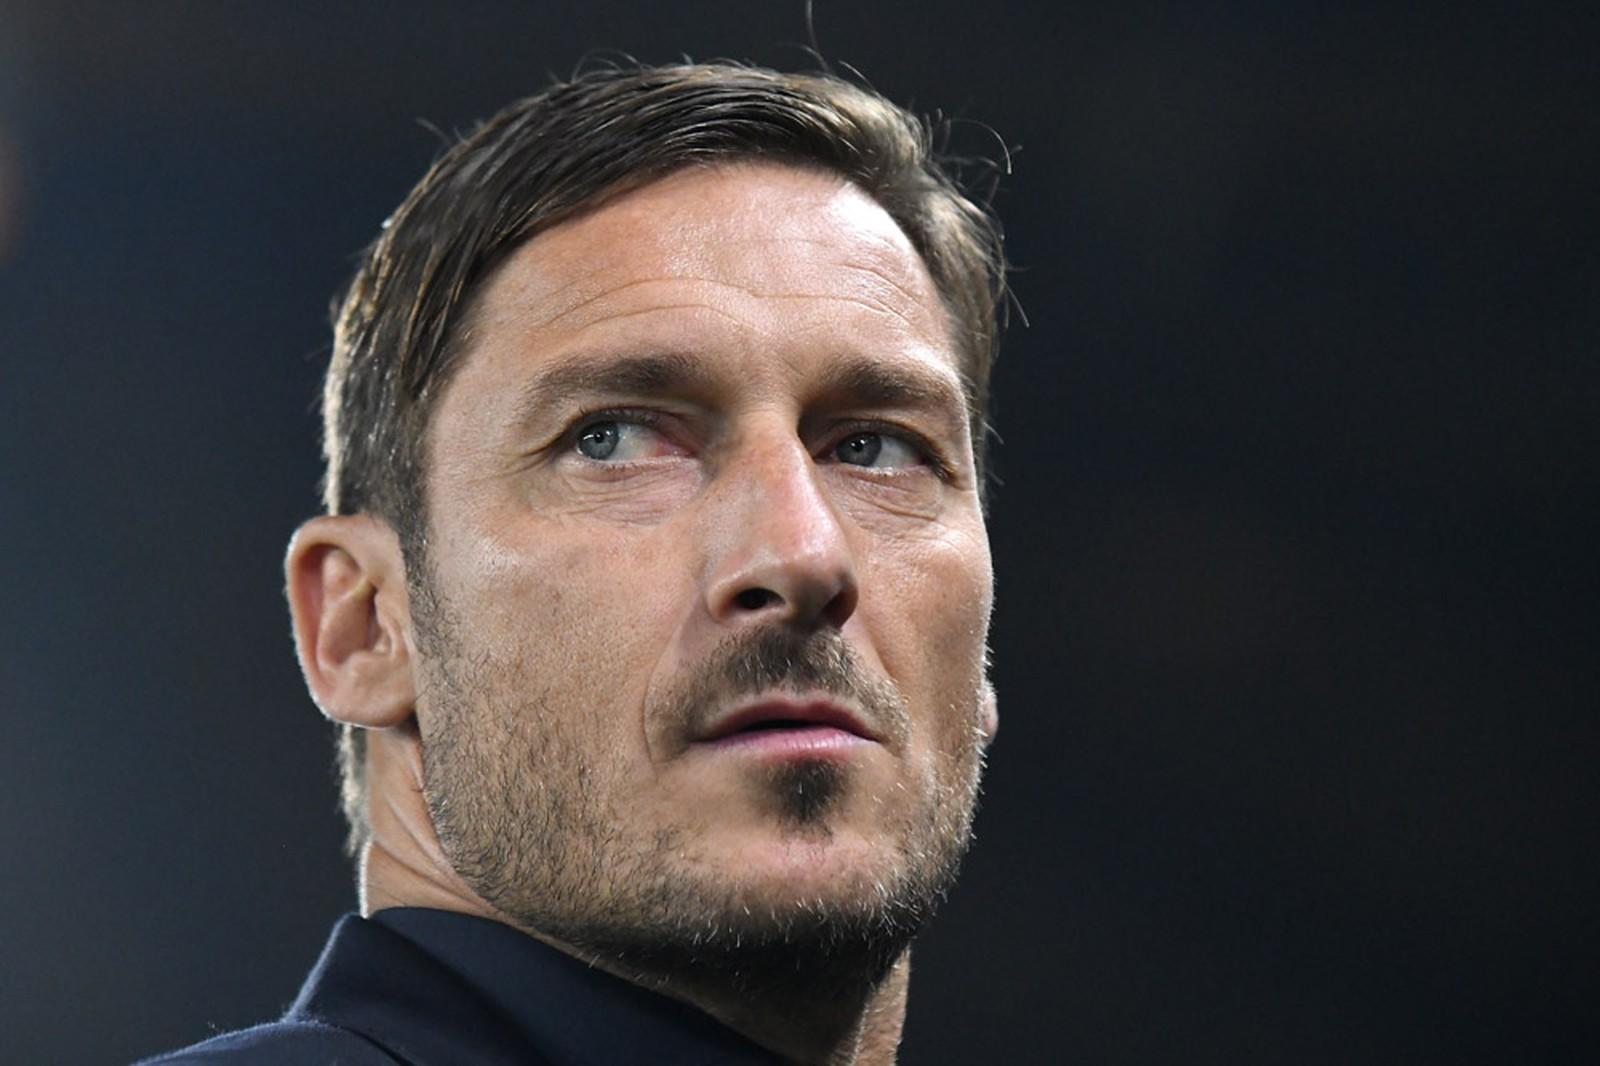 Botschafter statt Manager?: Roma-Rückkehr: Reicht Francesco Totti der  angebotene Posten?